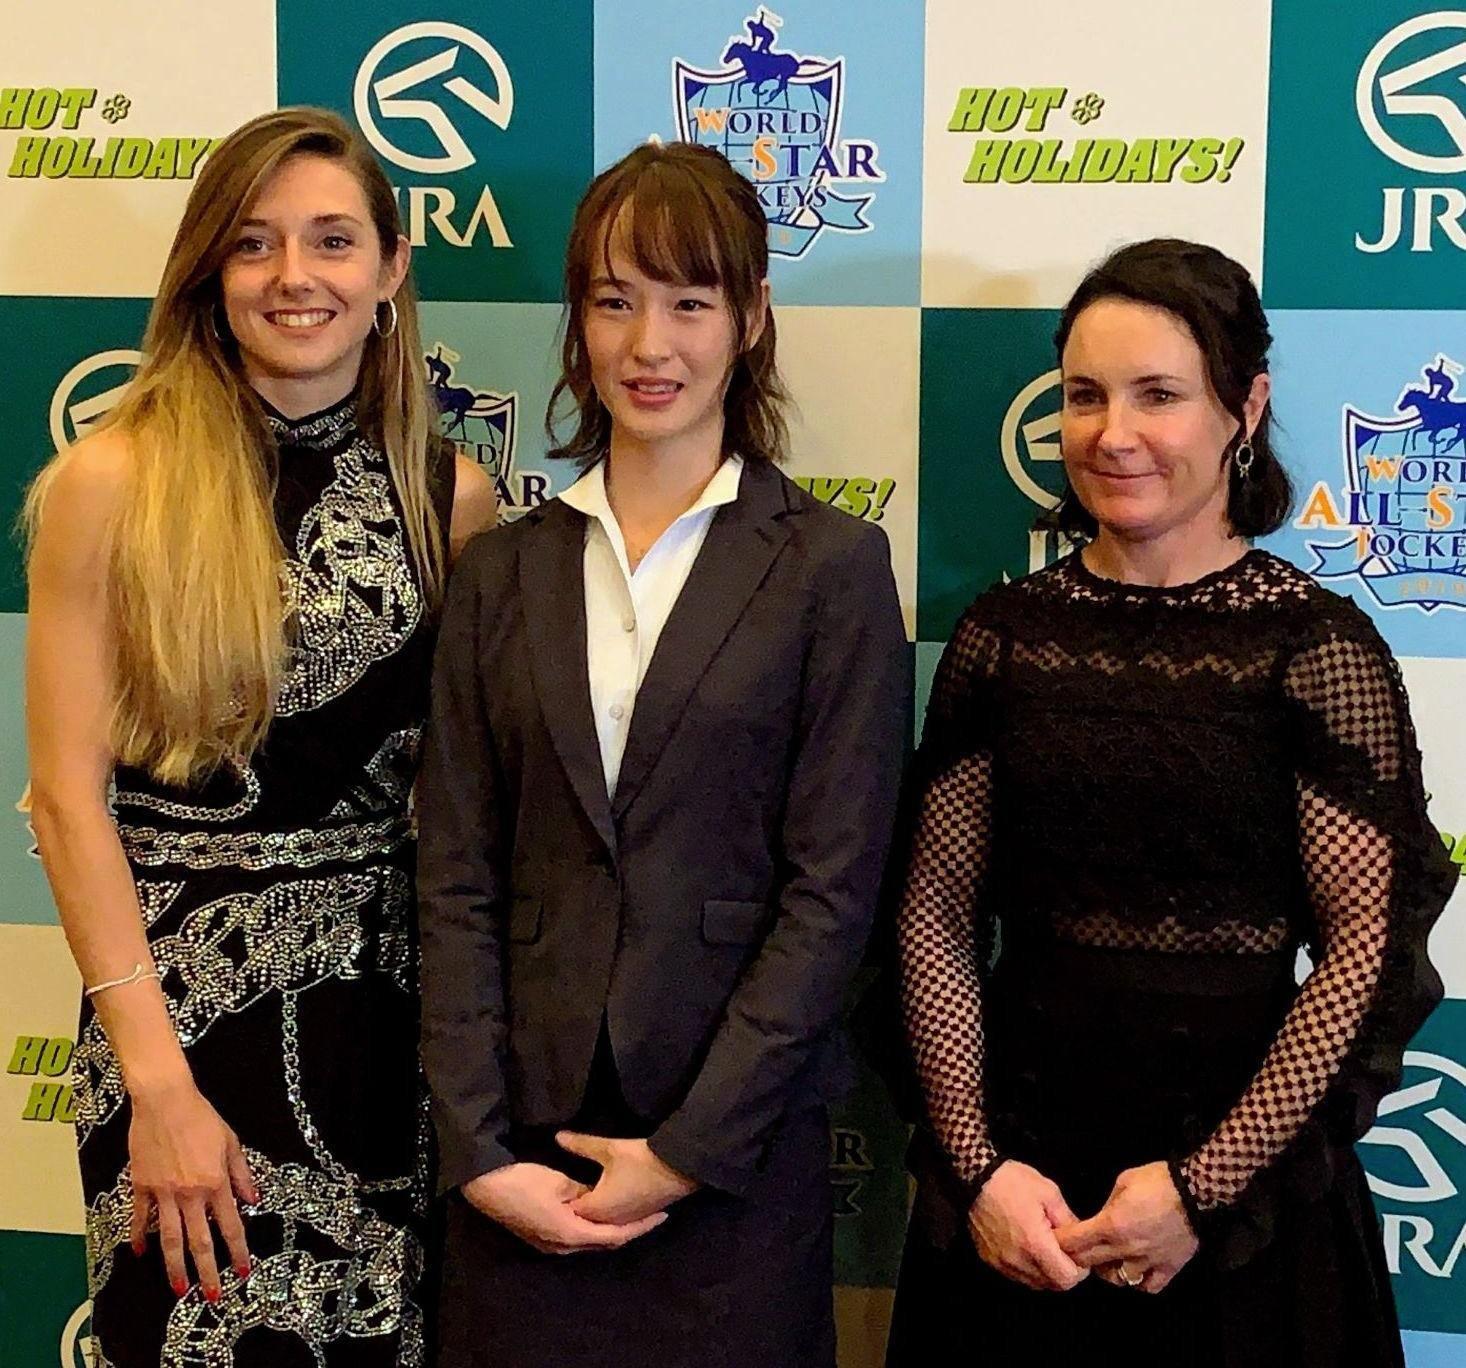 WASJに出場する女性3騎手(左から)ミシェル、藤田菜七子、オールプレス